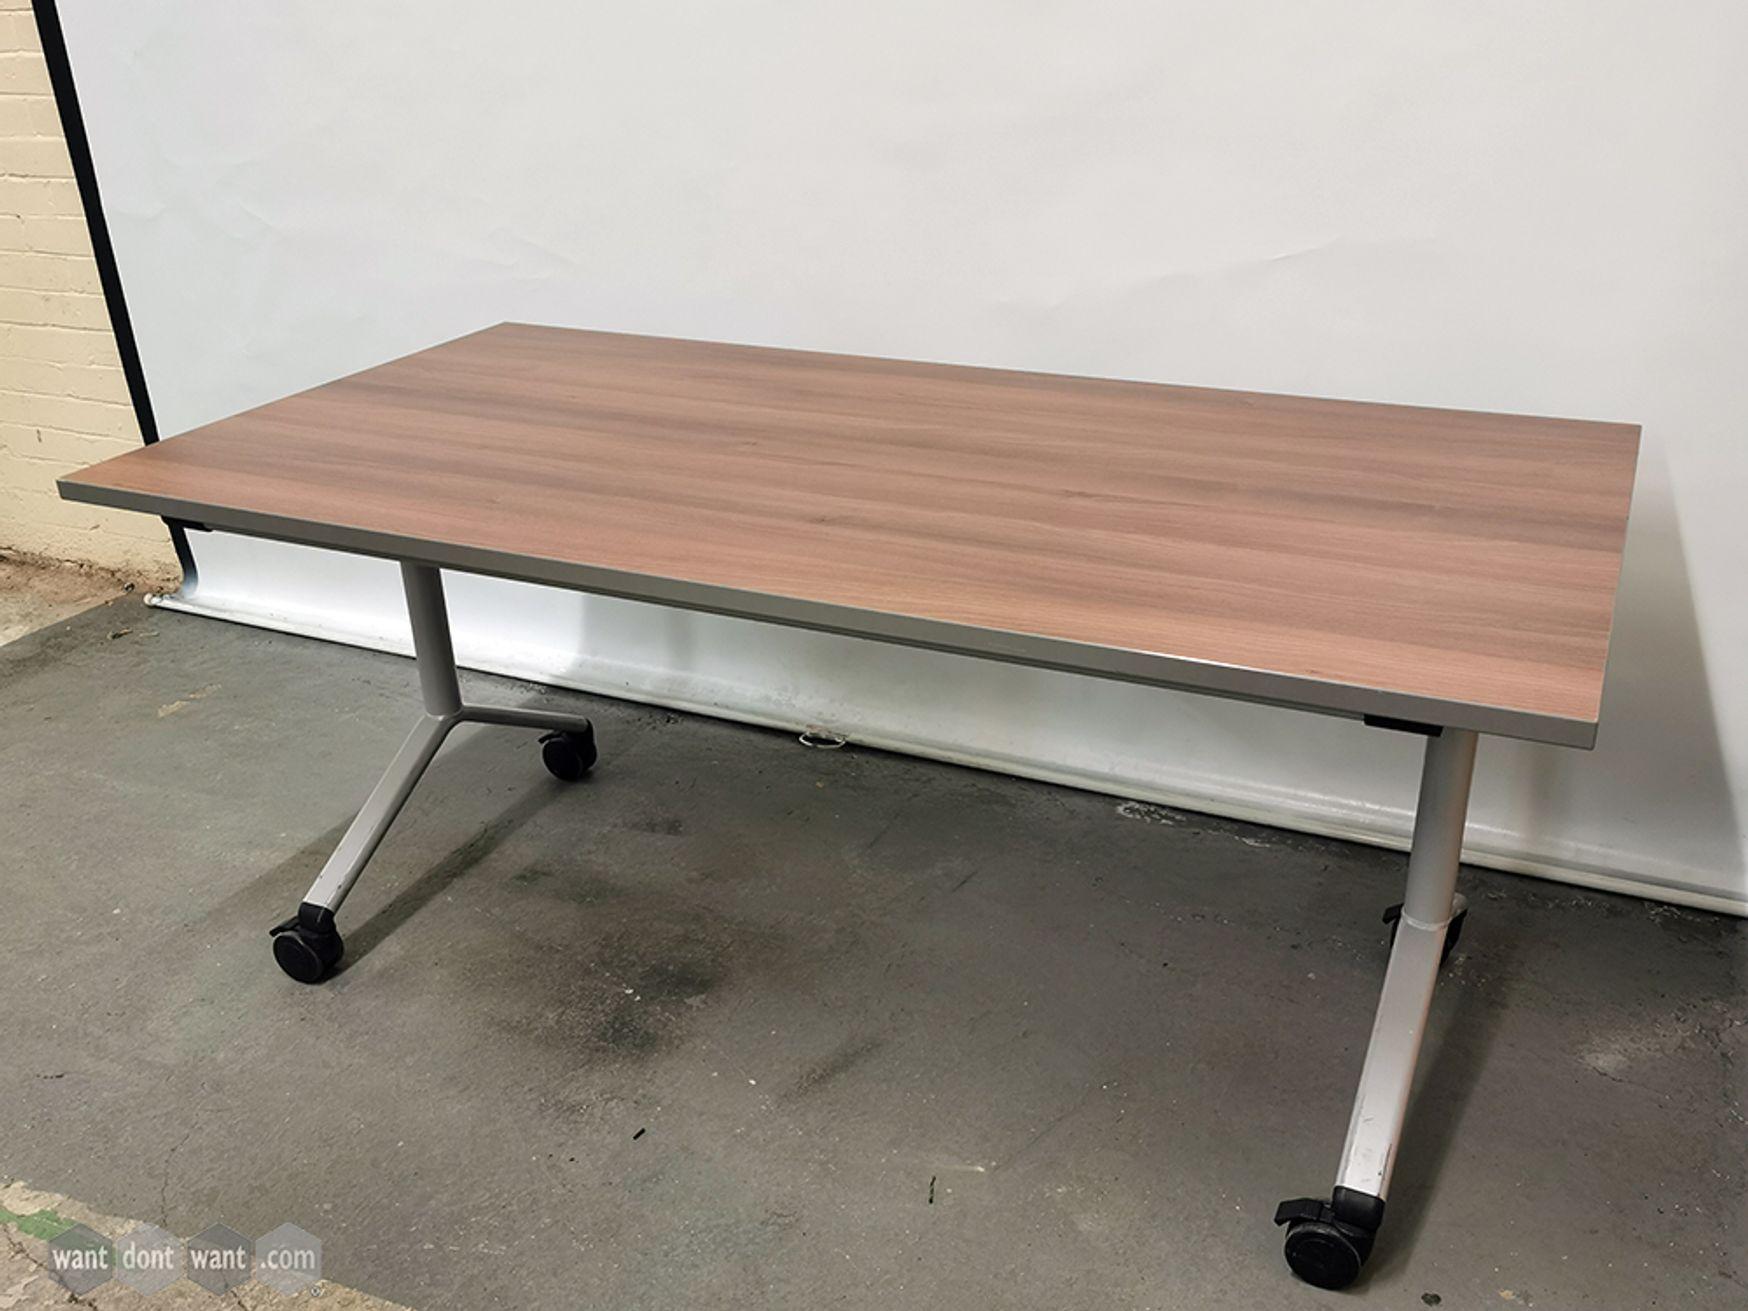 Used Verco Folding Flip-Top Table 1600mm x 800mm